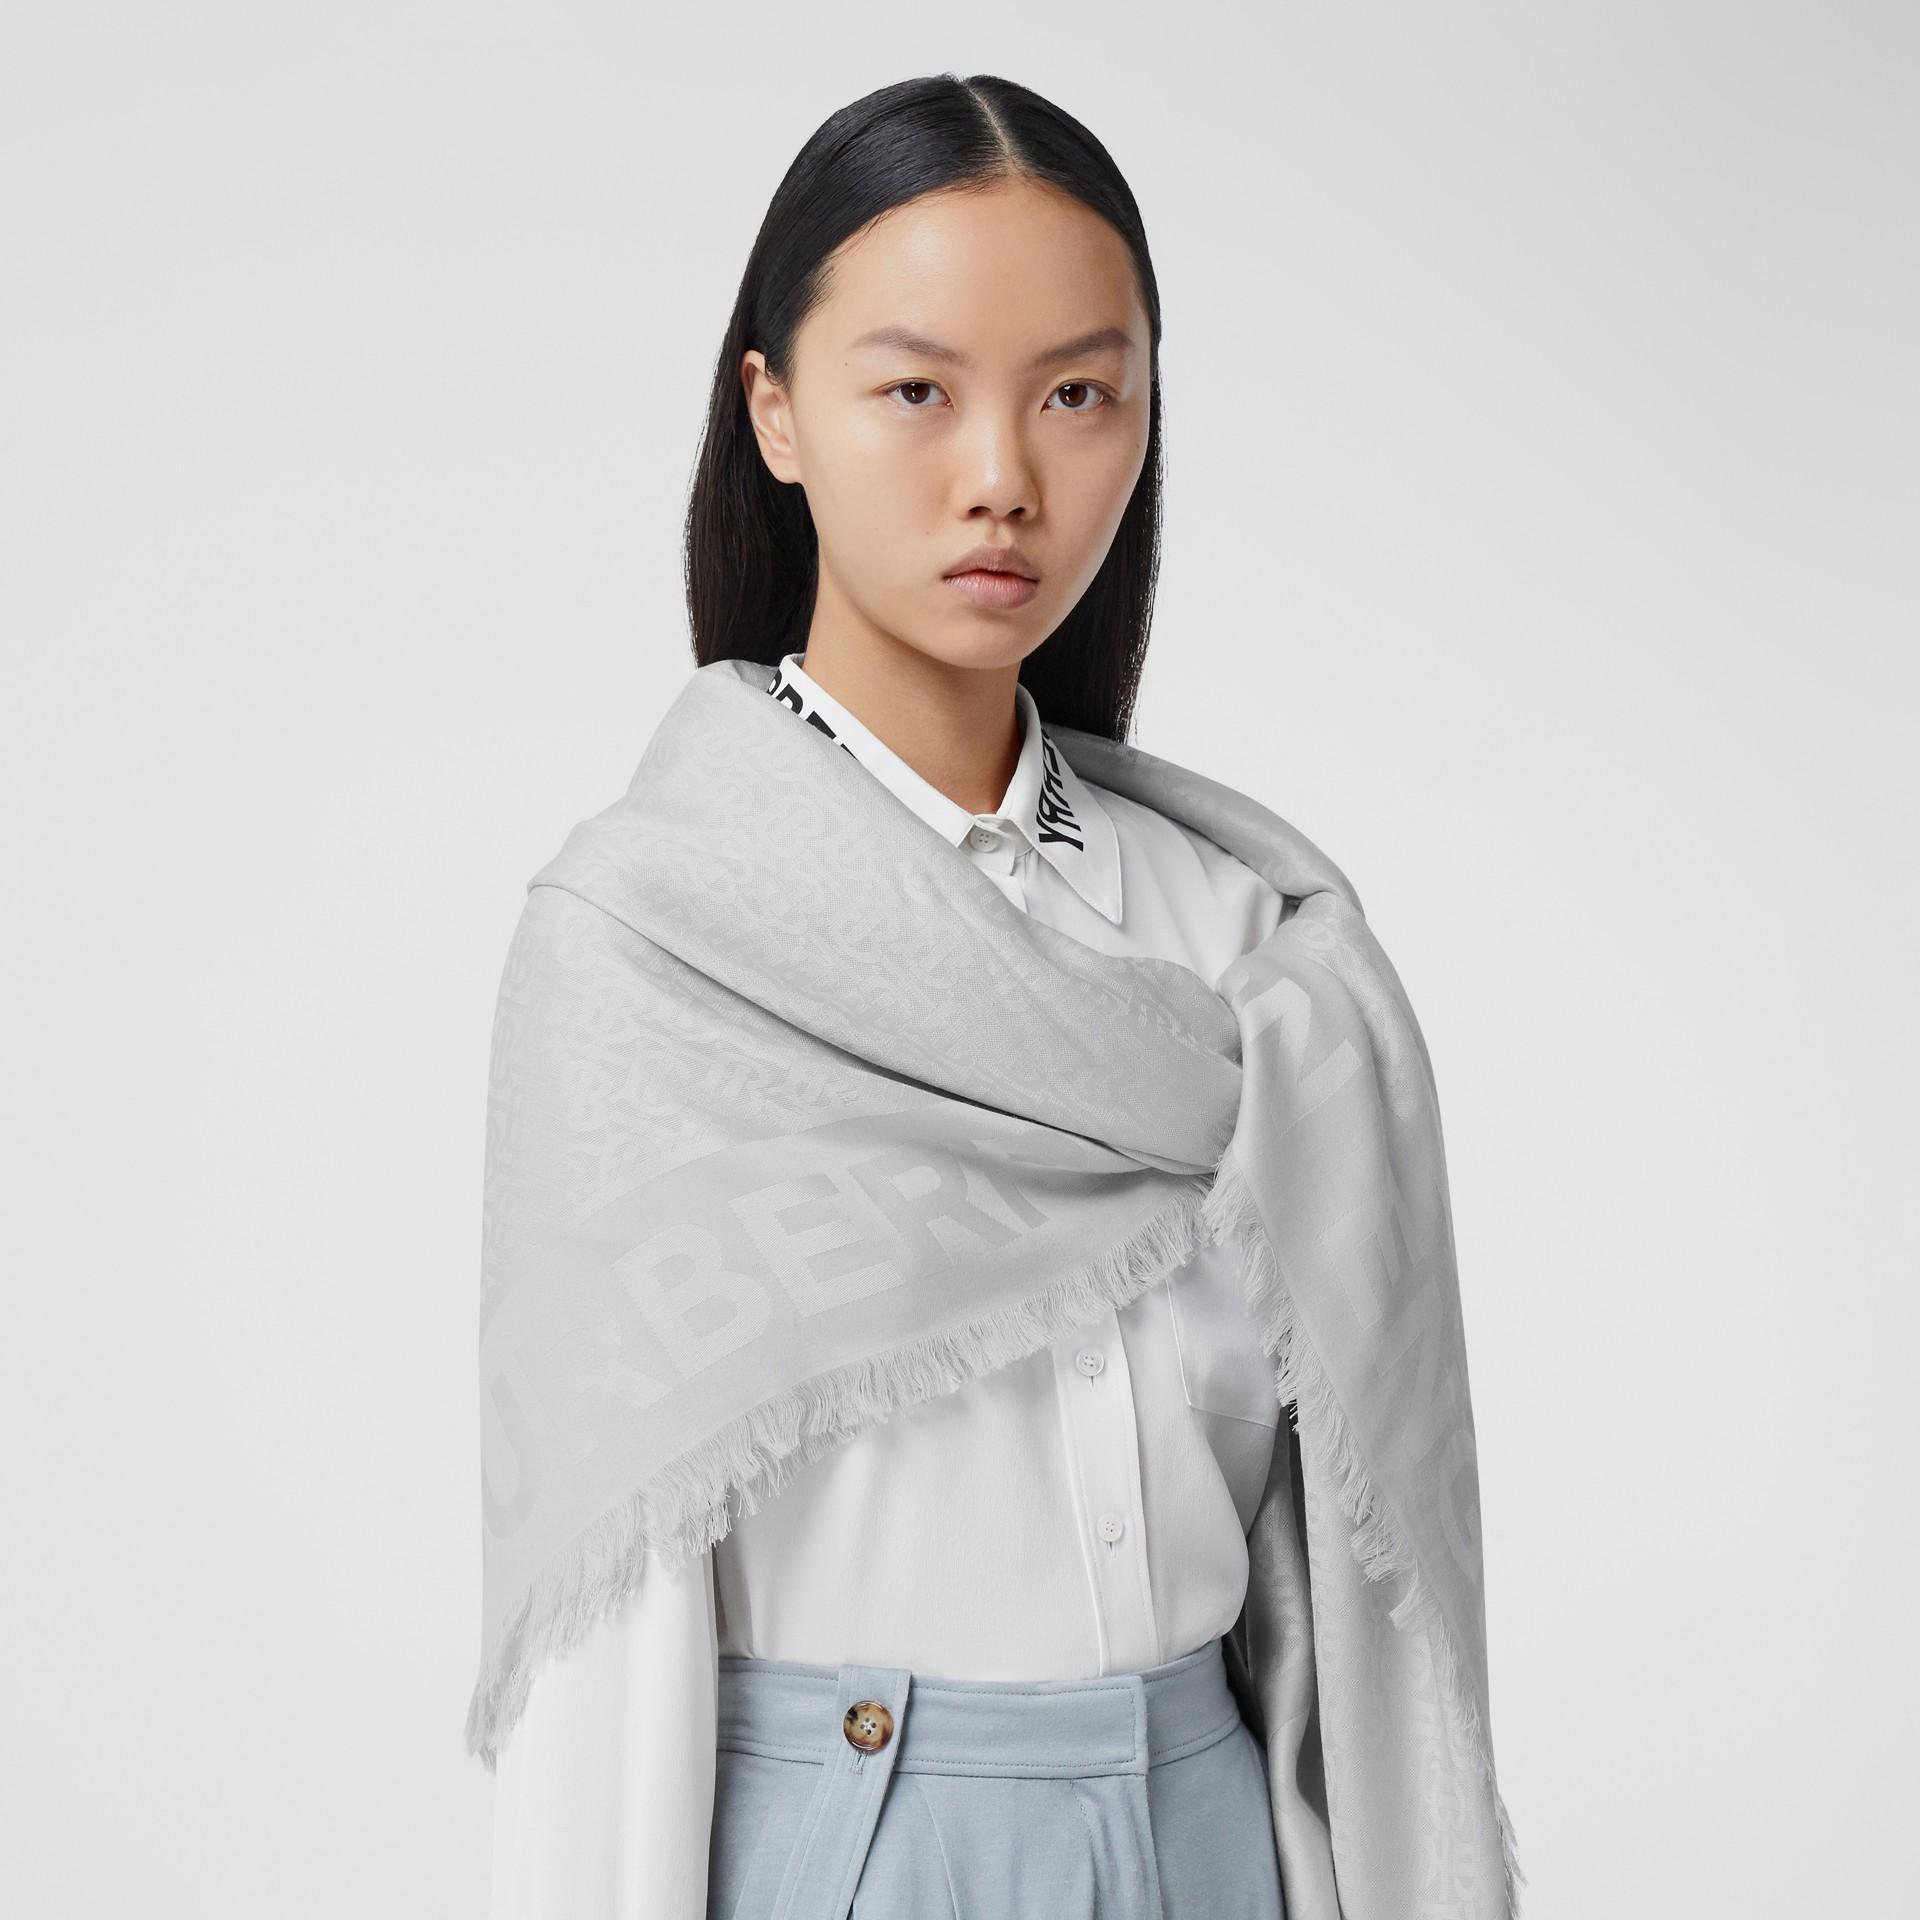 Monogram Silk Wool Jacquard Large Square Scarf in Light Pebble Grey | Burberry - gallery image 2